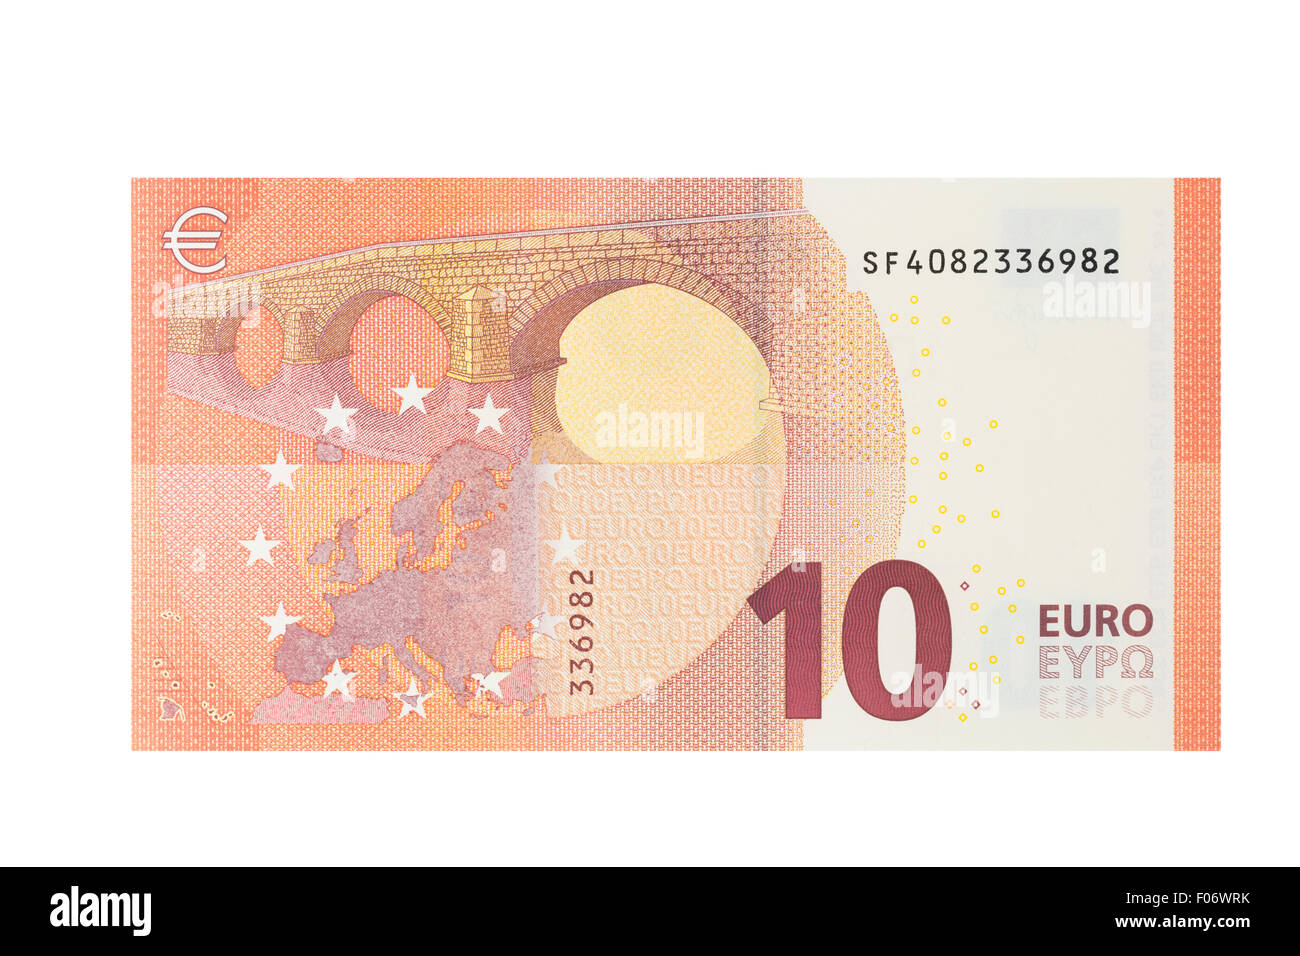 Ten Euro banknote on a white background - Stock Image